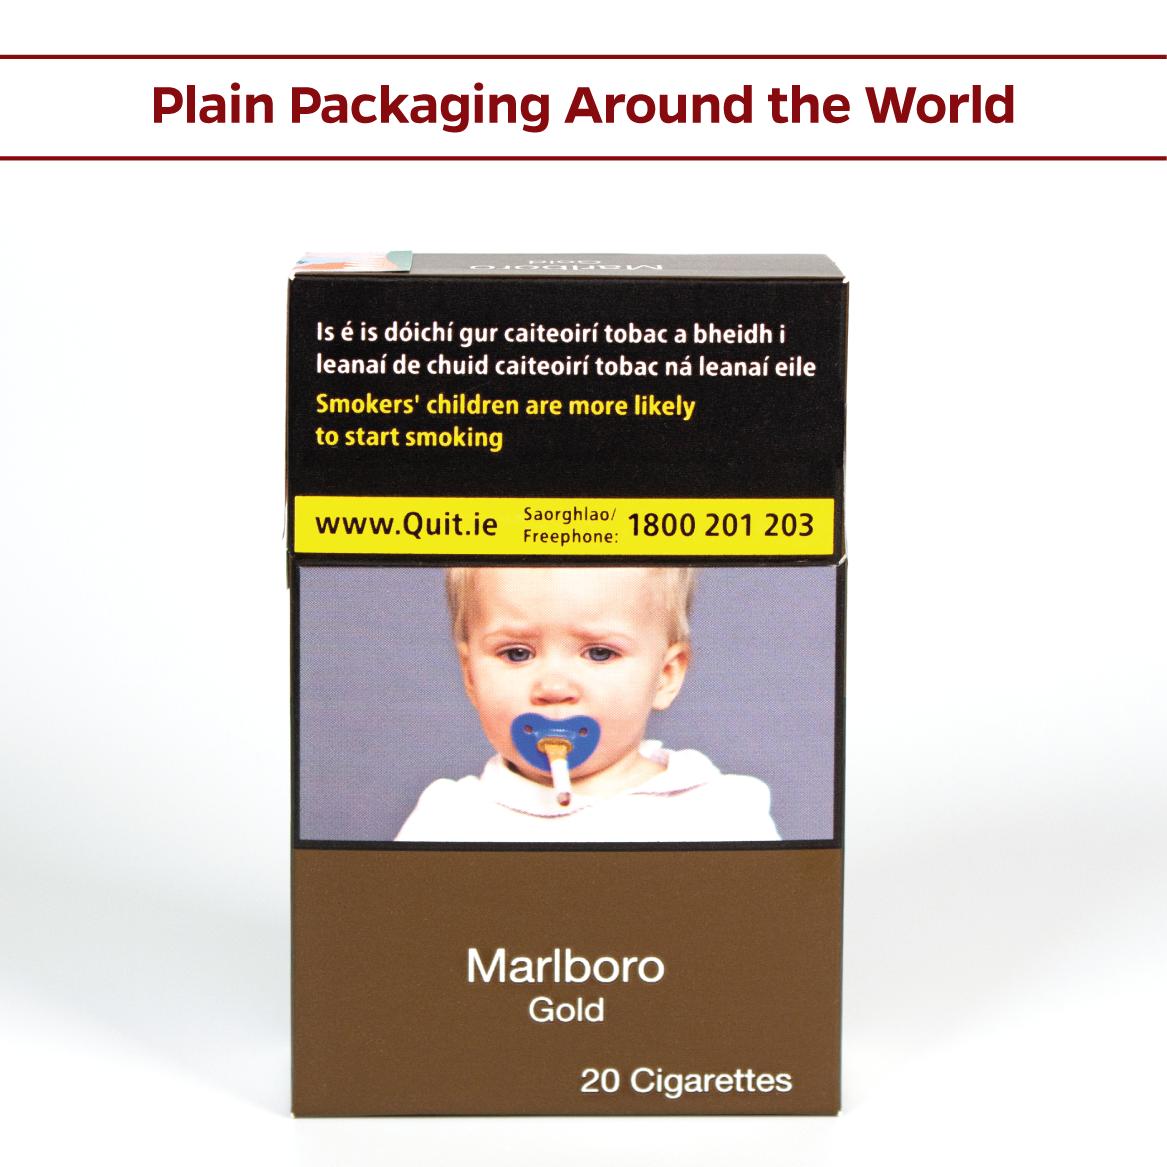 Plain Packaging image